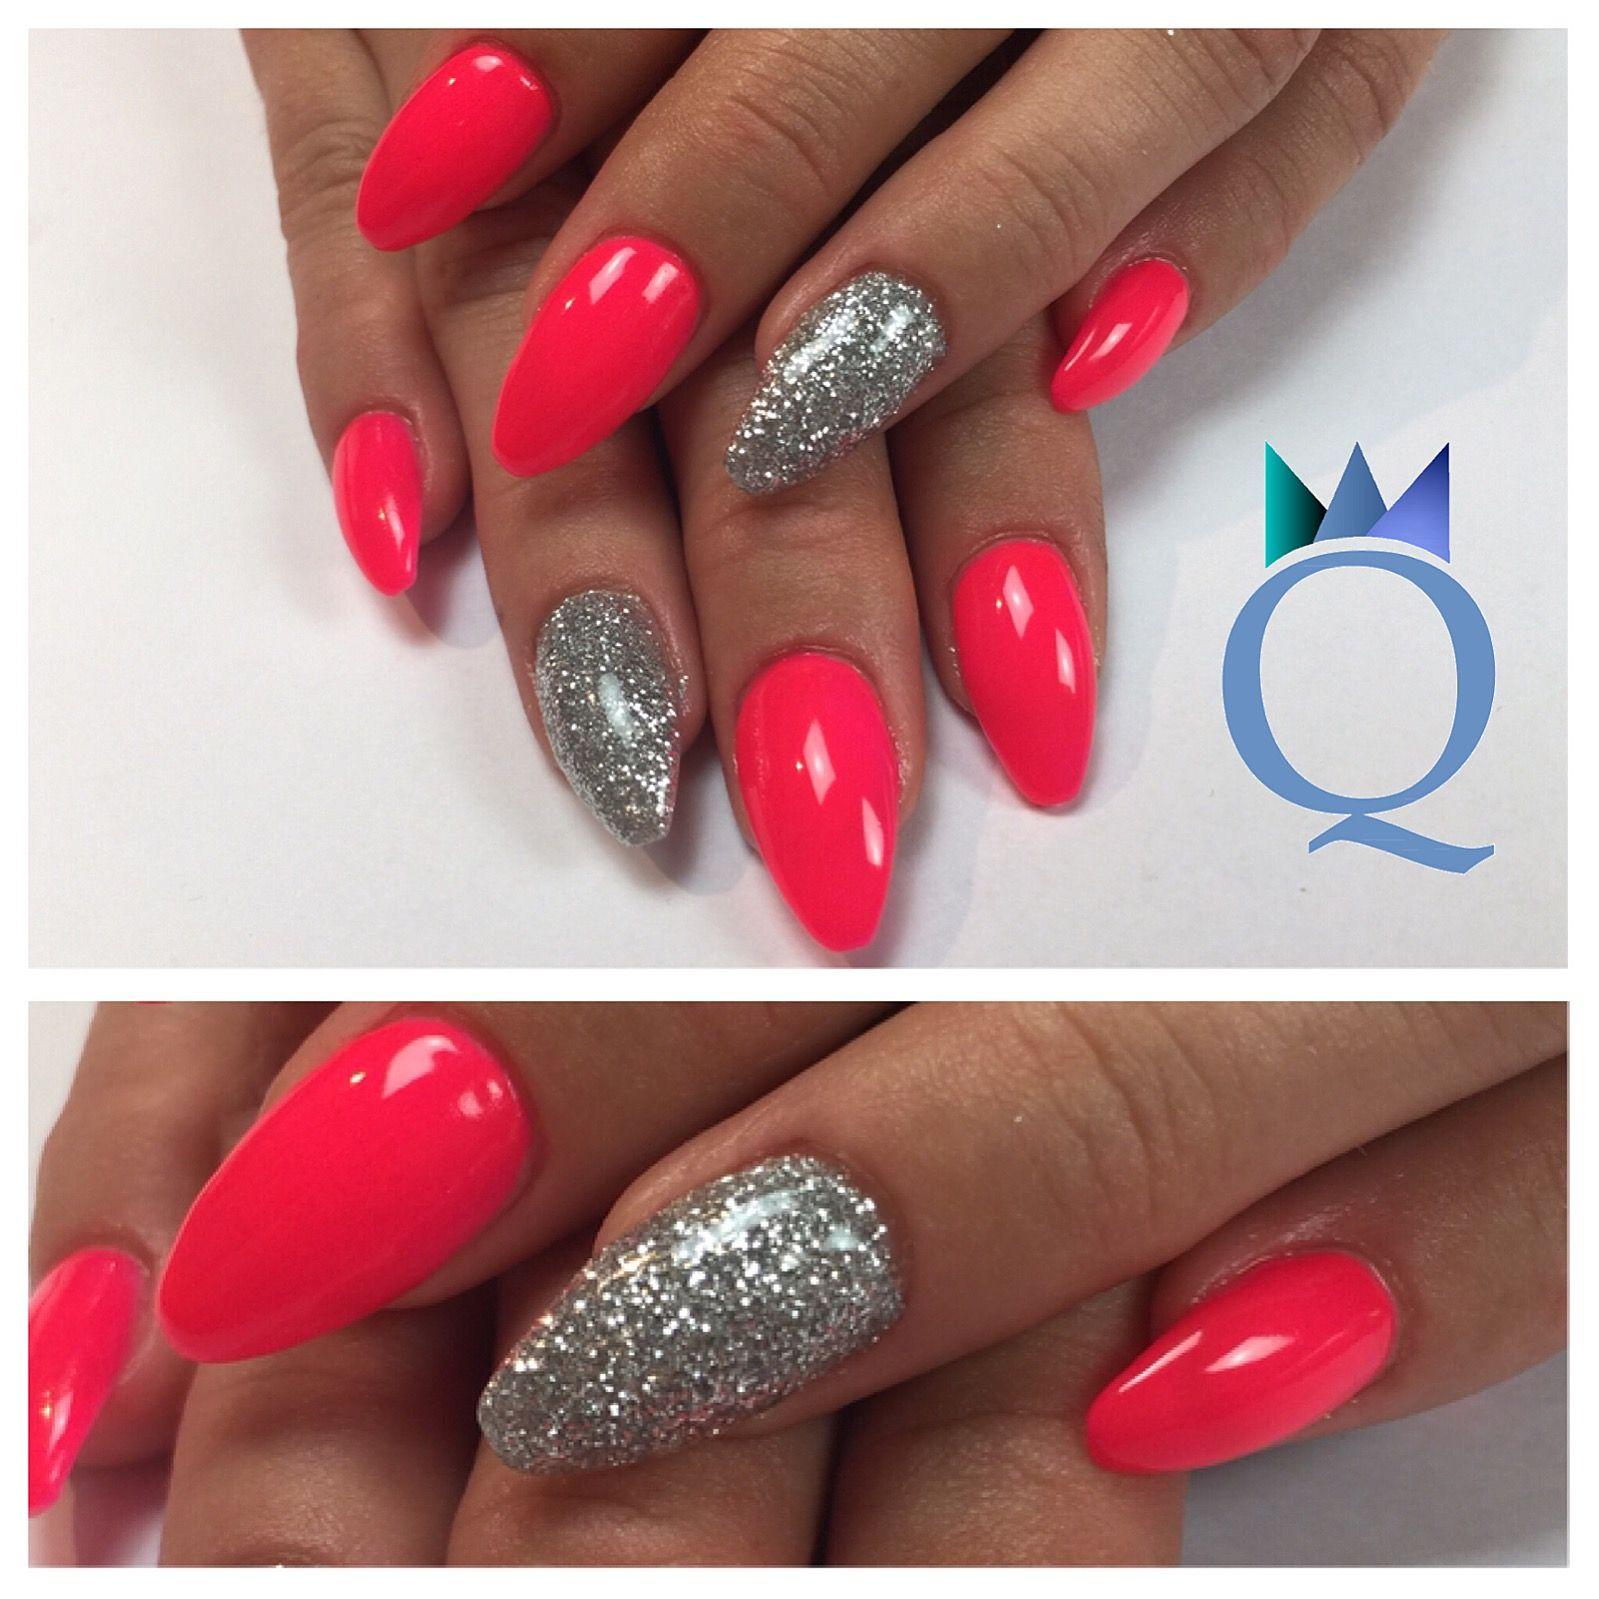 coffinnails gelnails nails neonpink silver glitter ballerinaform geln gel n gel neon. Black Bedroom Furniture Sets. Home Design Ideas